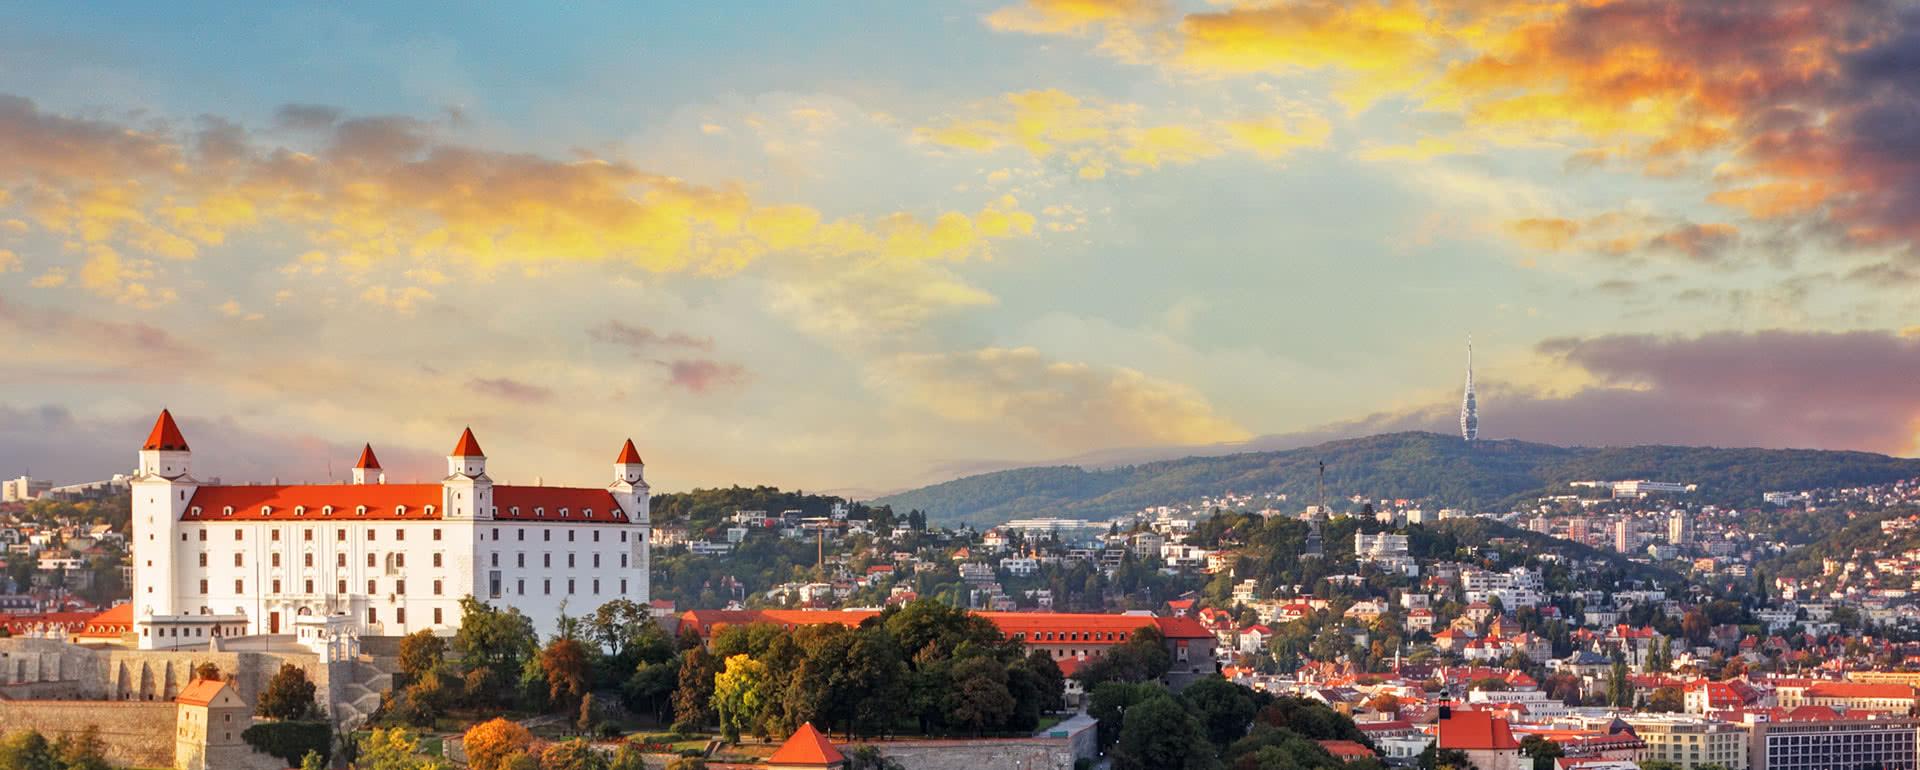 Titelbild von Bratislava